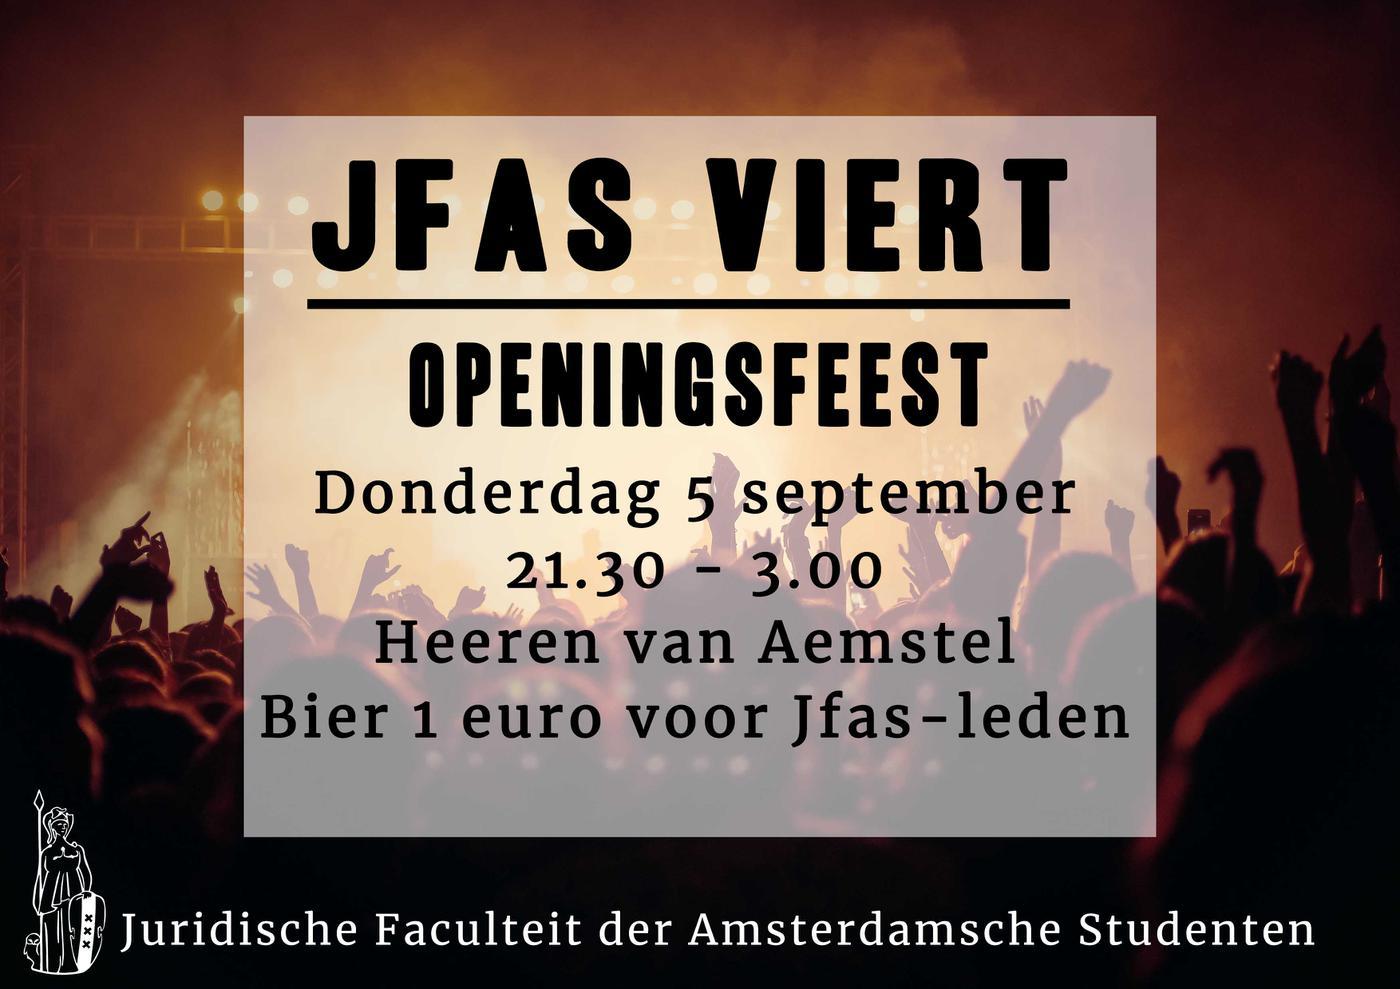 Openingsfeest